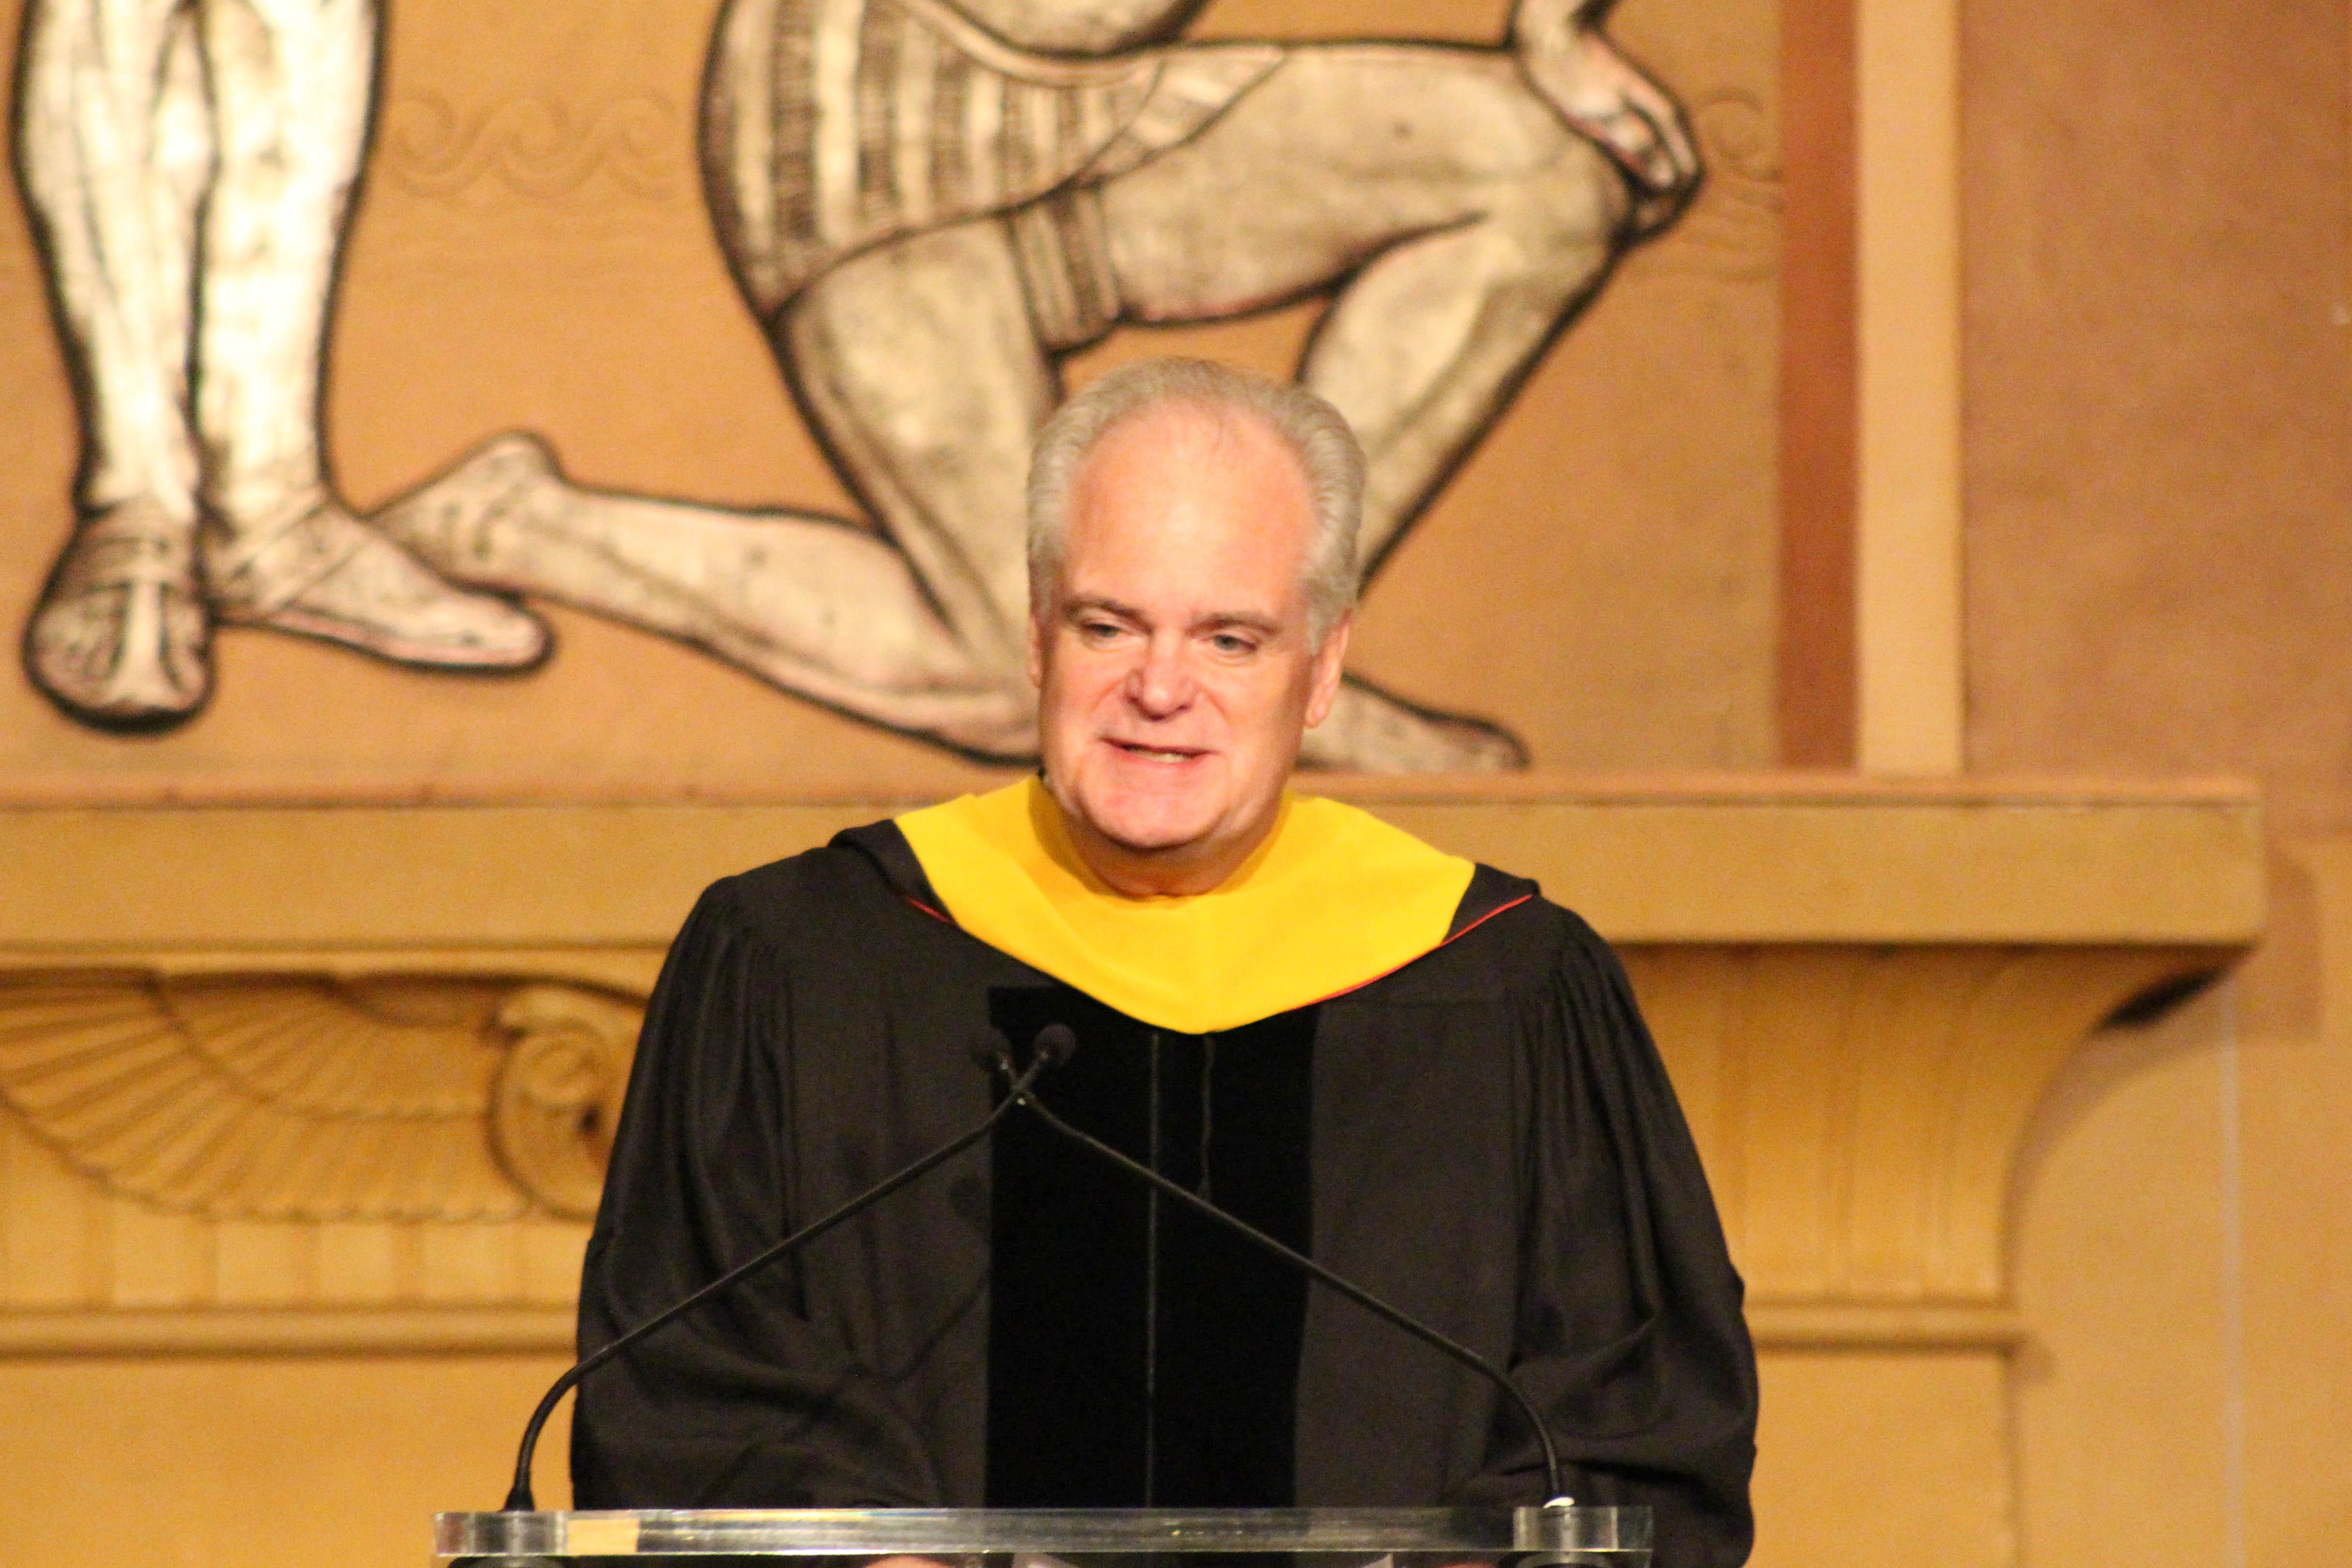 HCA's Dr. Bruce Deighton welcomes Trinity graduates to the profession of medicine